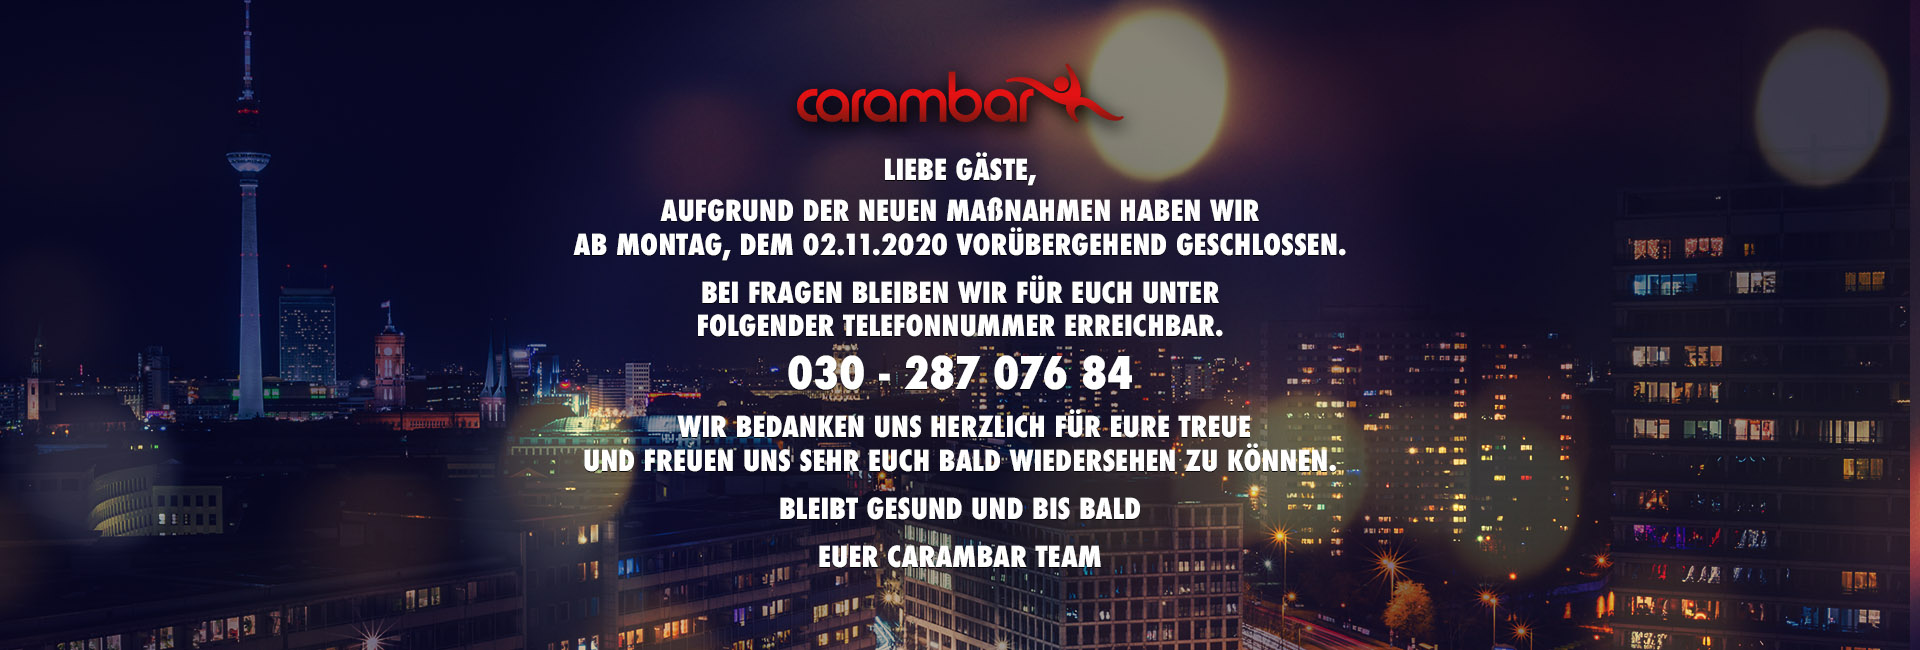 Carambar-Info-Screen-Winter2020-Slider2